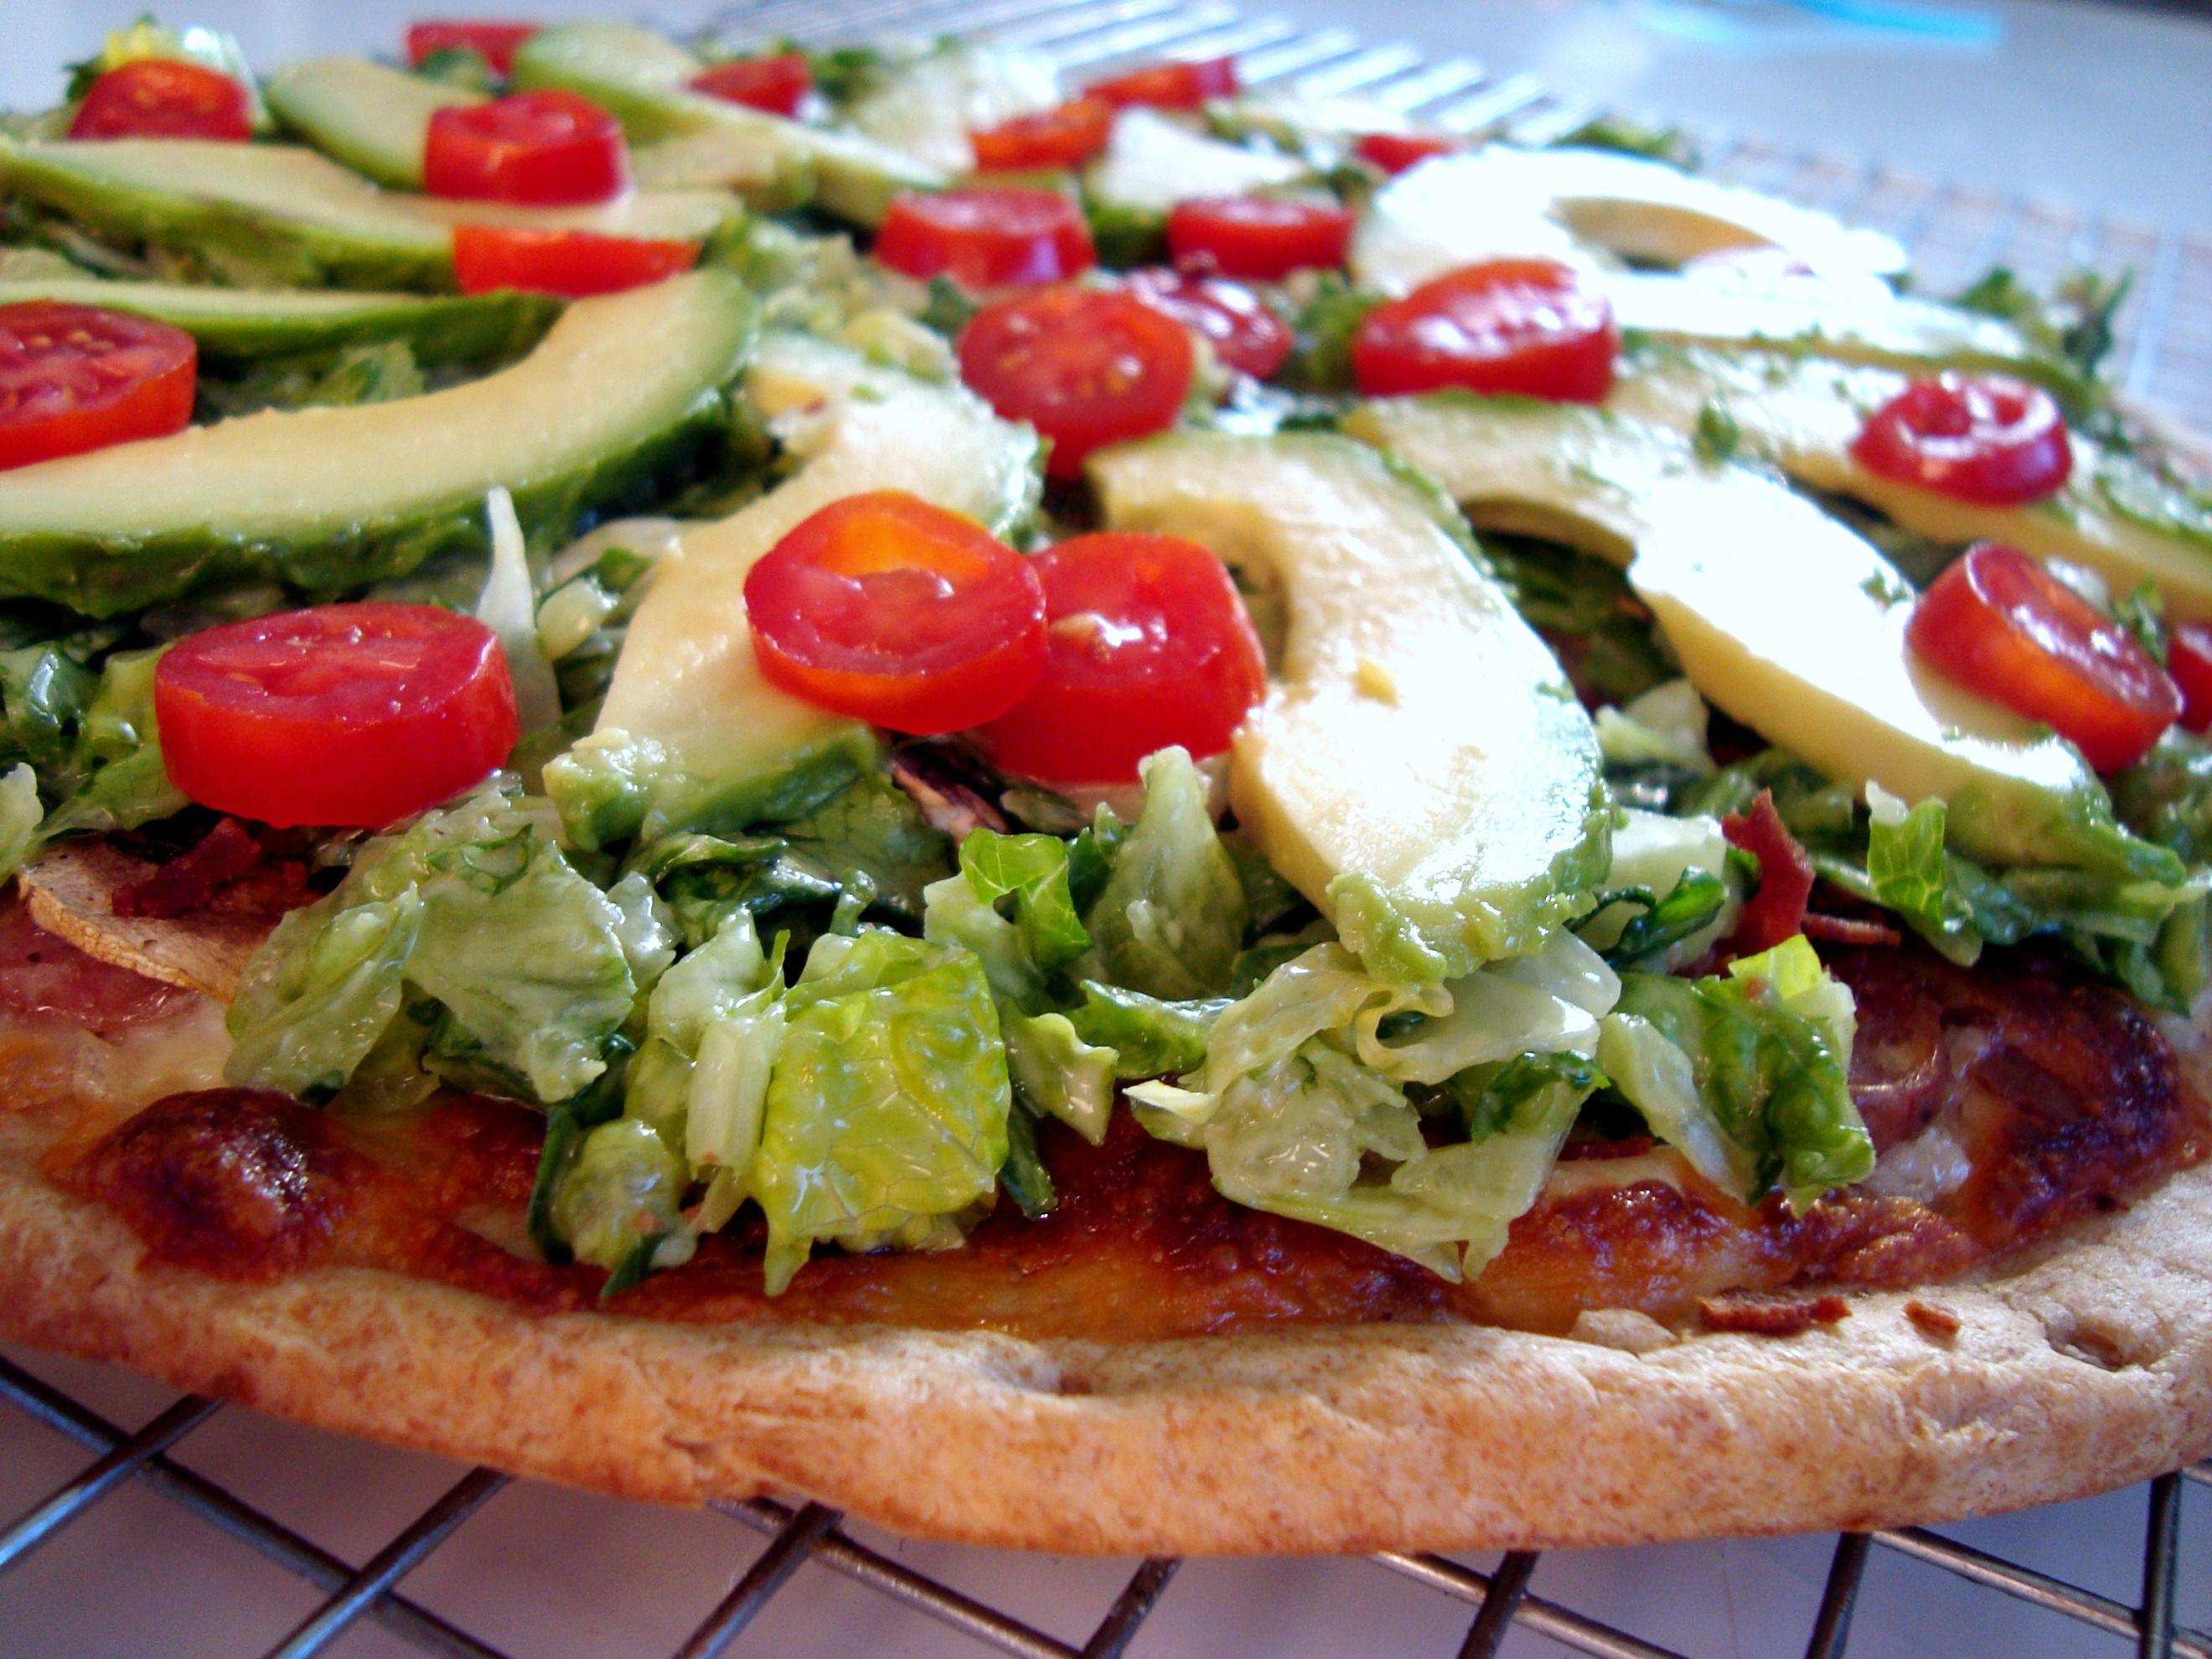 stylish california pizza kitchen the family chapters also california pizza kitchen calories - California Pizza Kitchen Calories